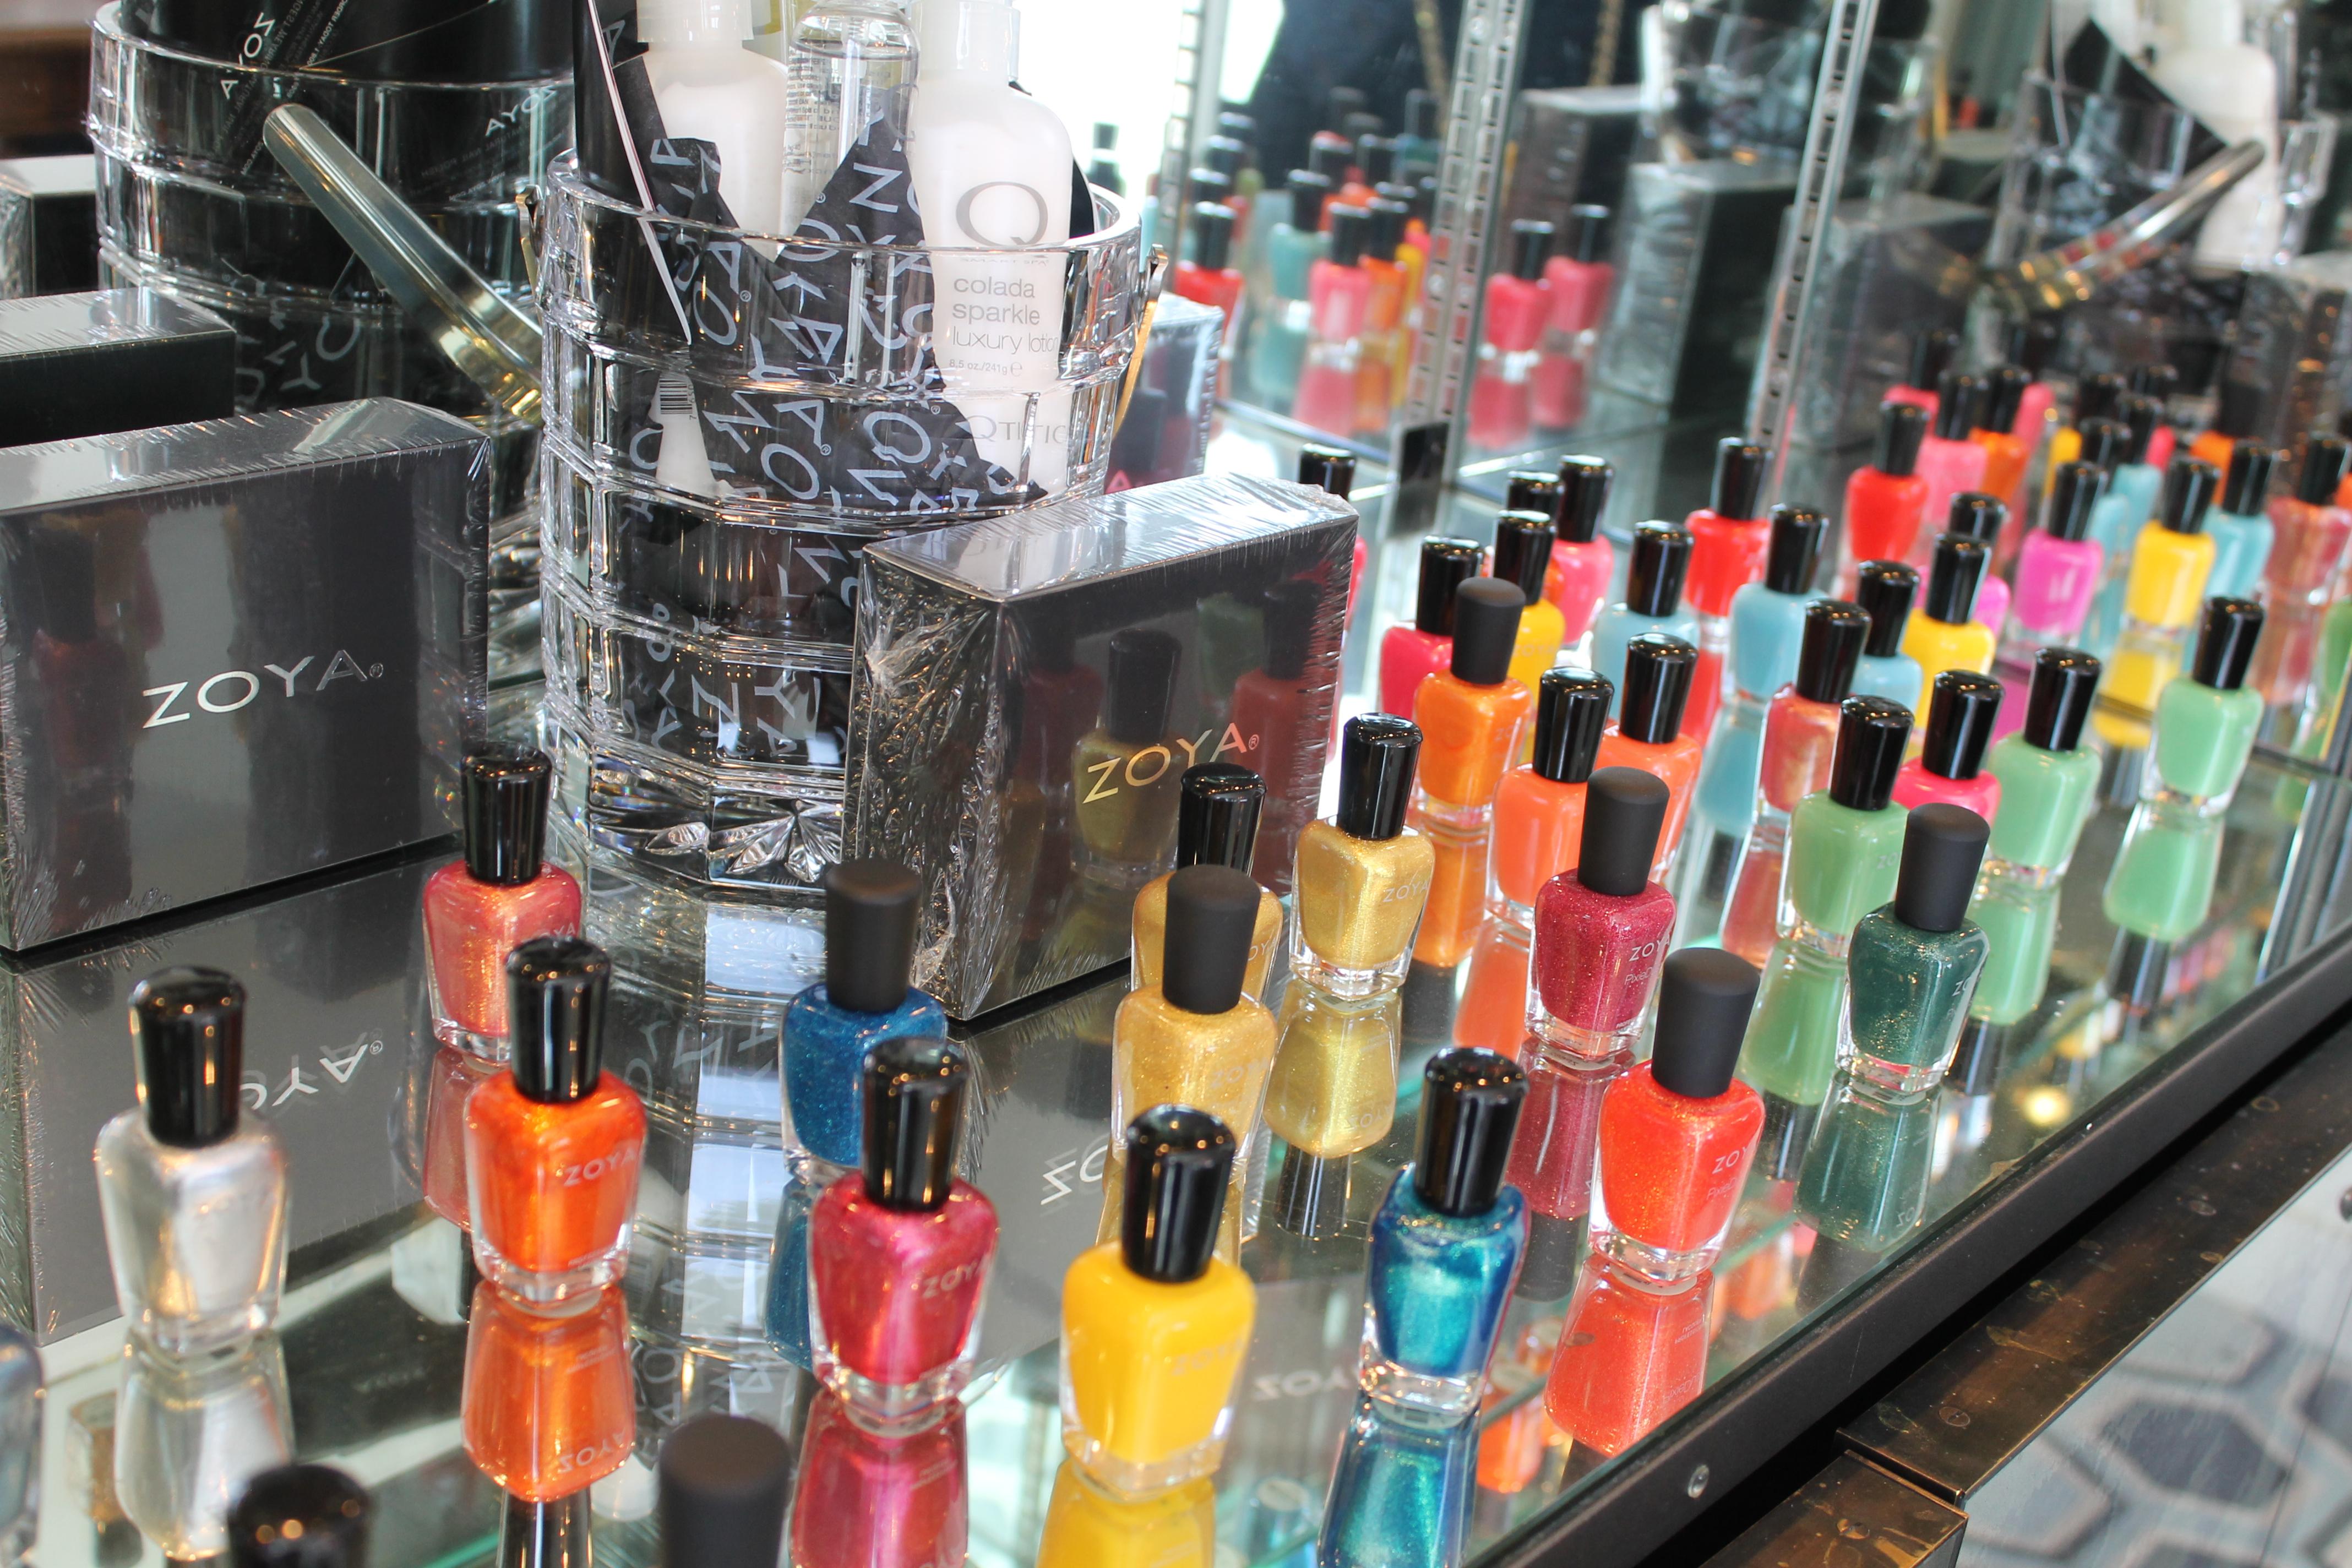 Day nails besides nail polish glass christmas ornament craft on plain